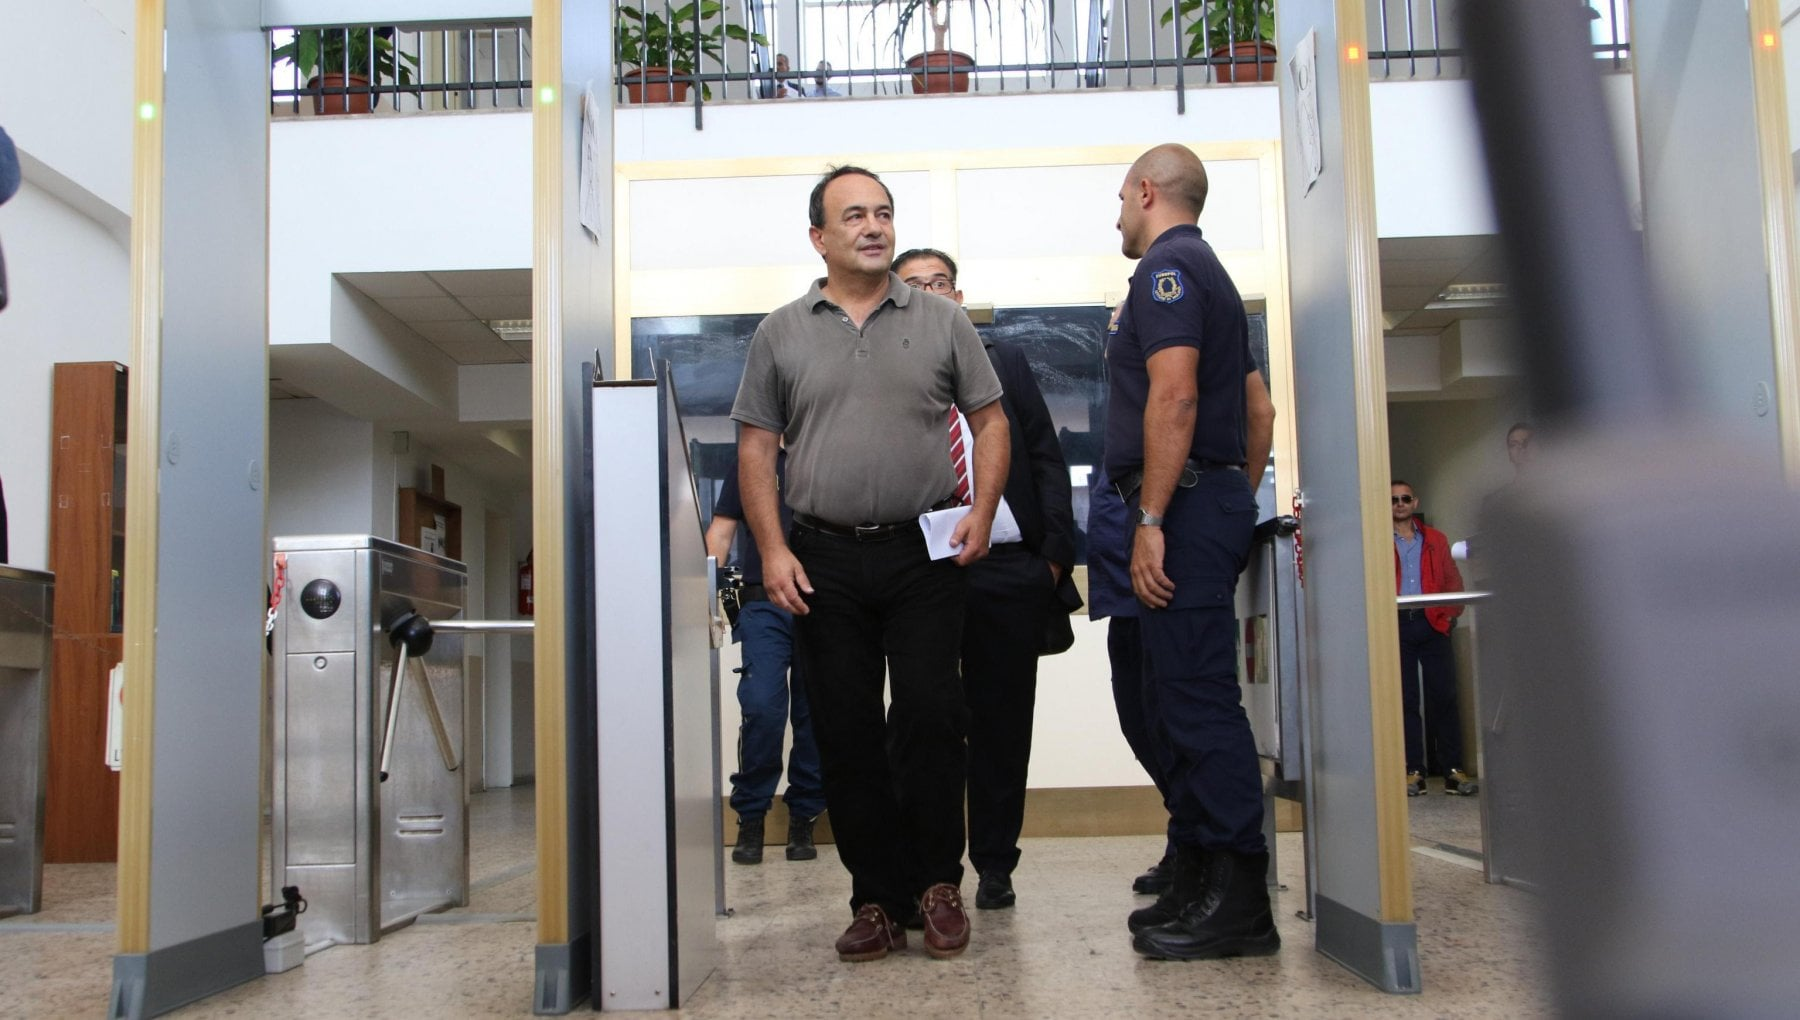 Riace, l'accusa chiede 7 anni e 11 mesi per l'ex sindaco Mimmo Lucano